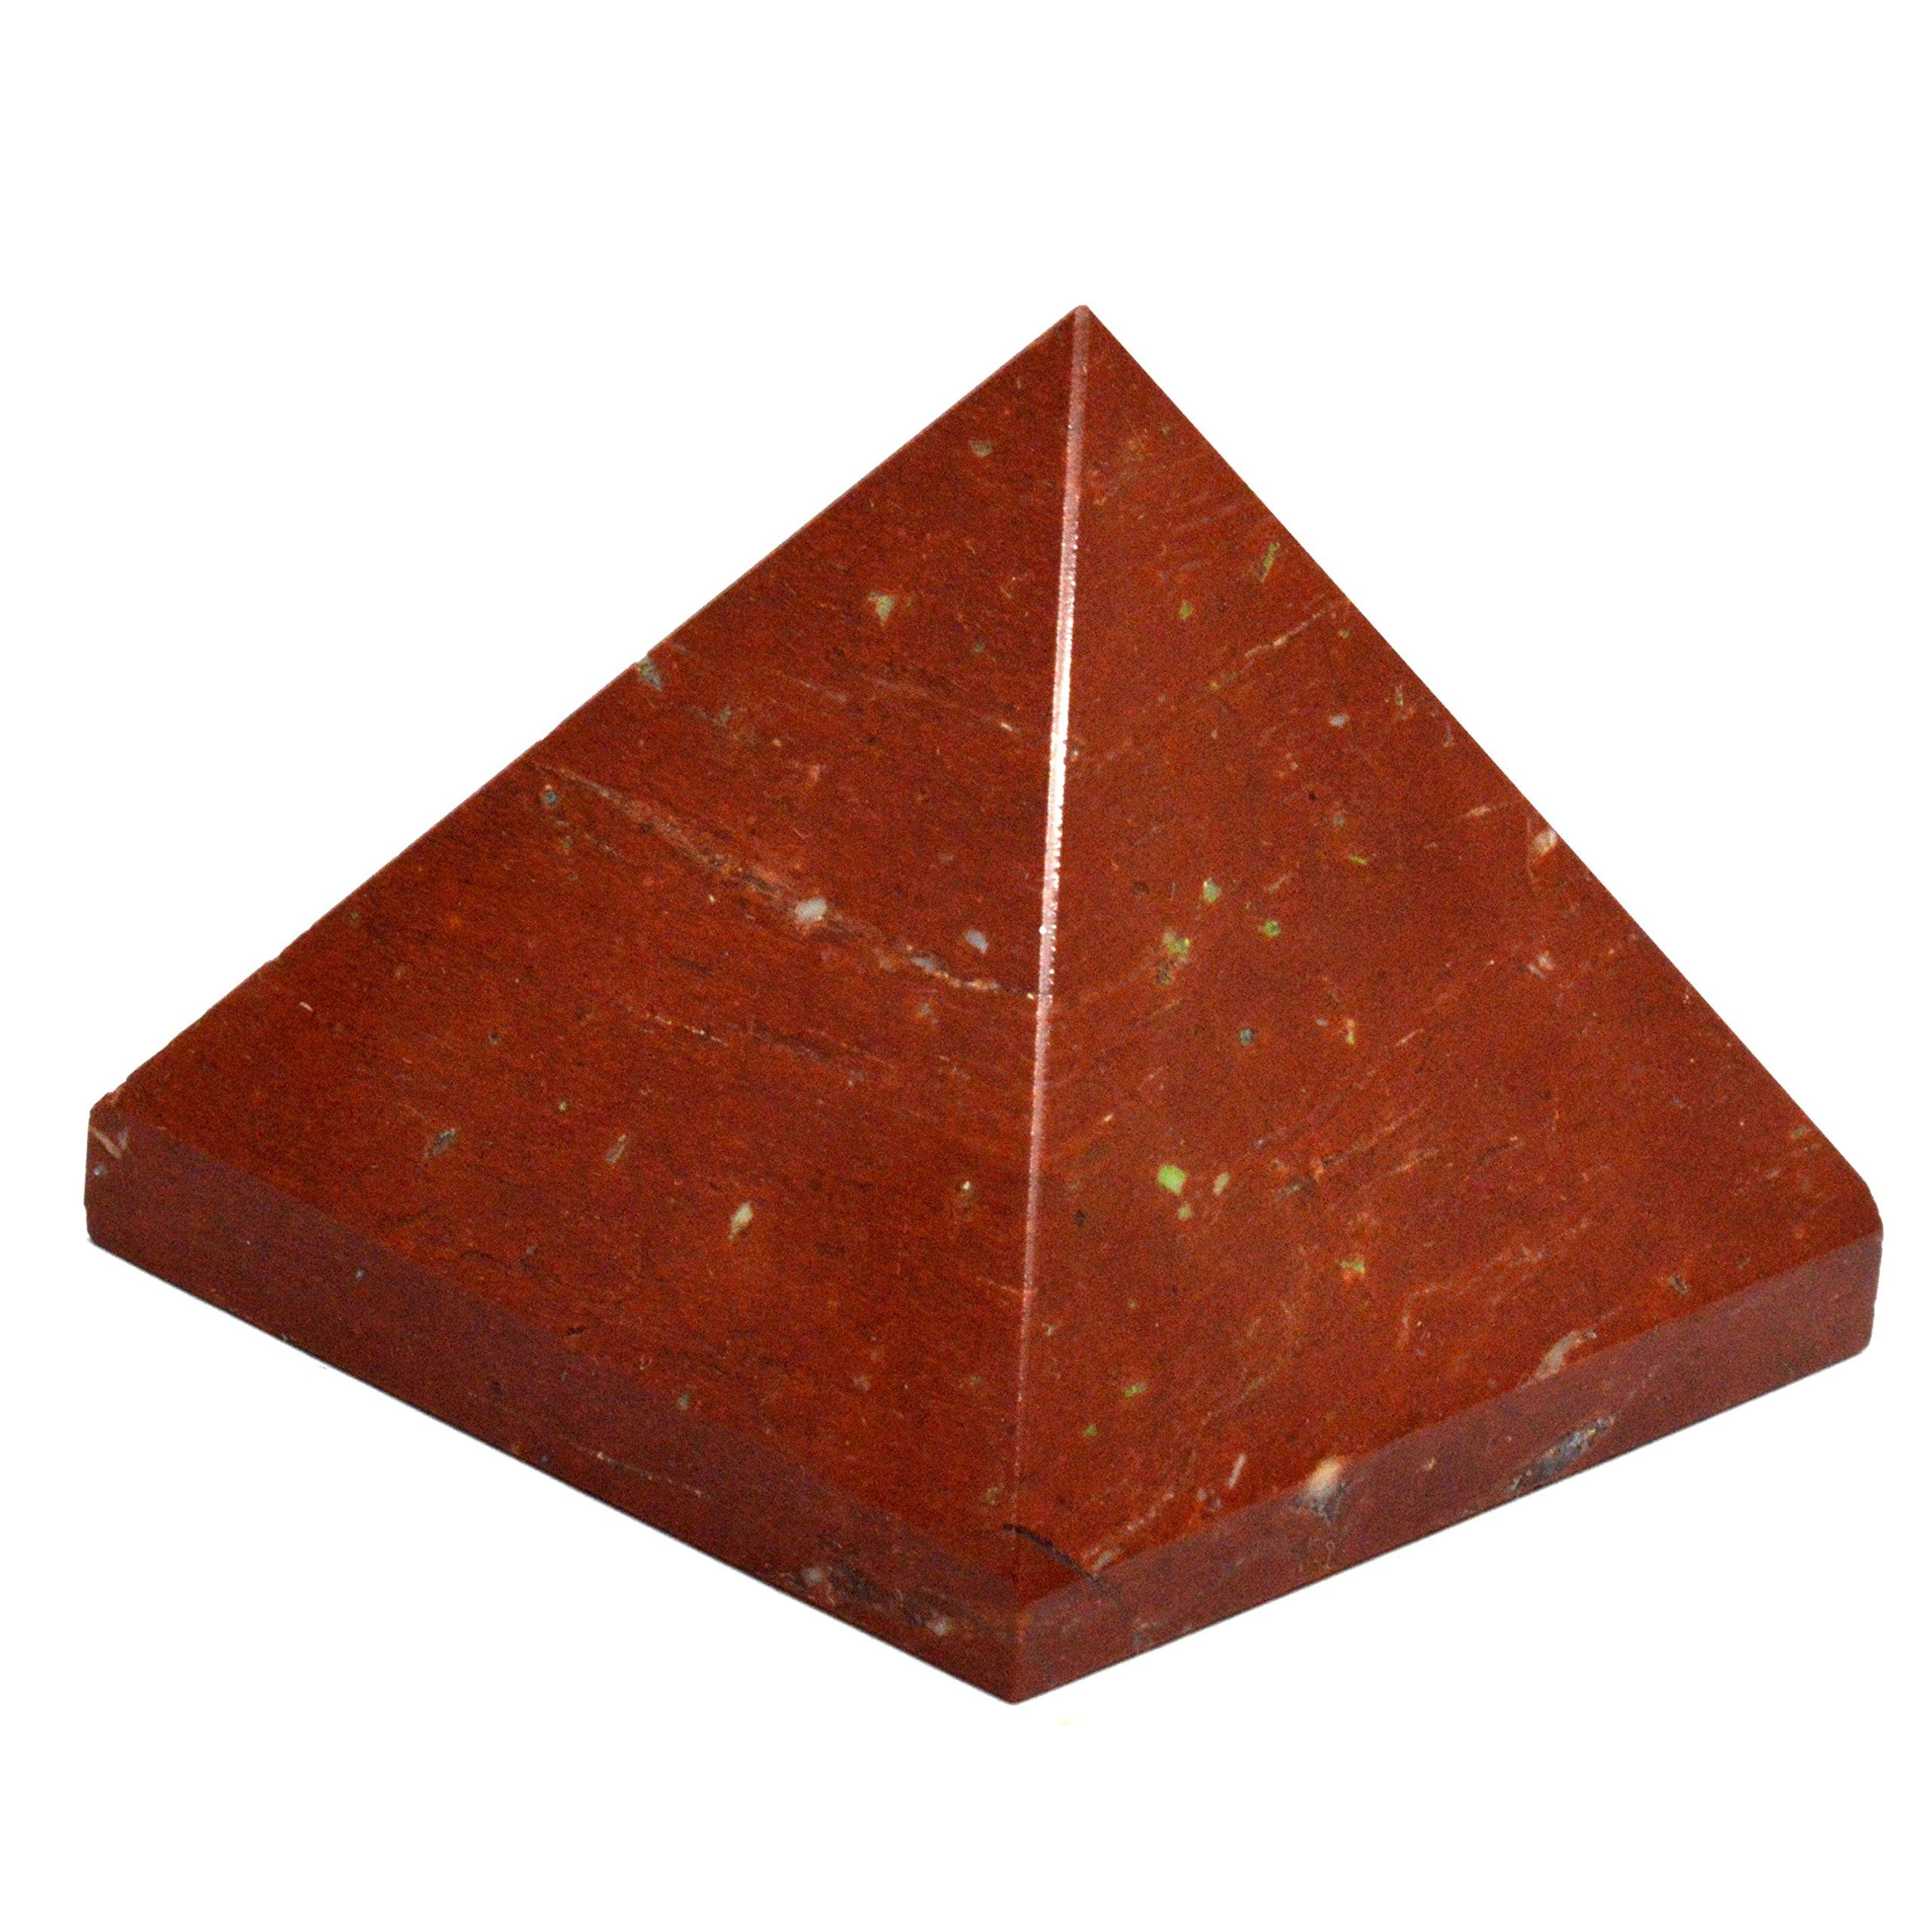 Healing Crystals India Natural Gemstone Red Aventurine 0.8'' Pyramid Feng Shui Spiritual Reiki Healing Energy Charged Pyramid